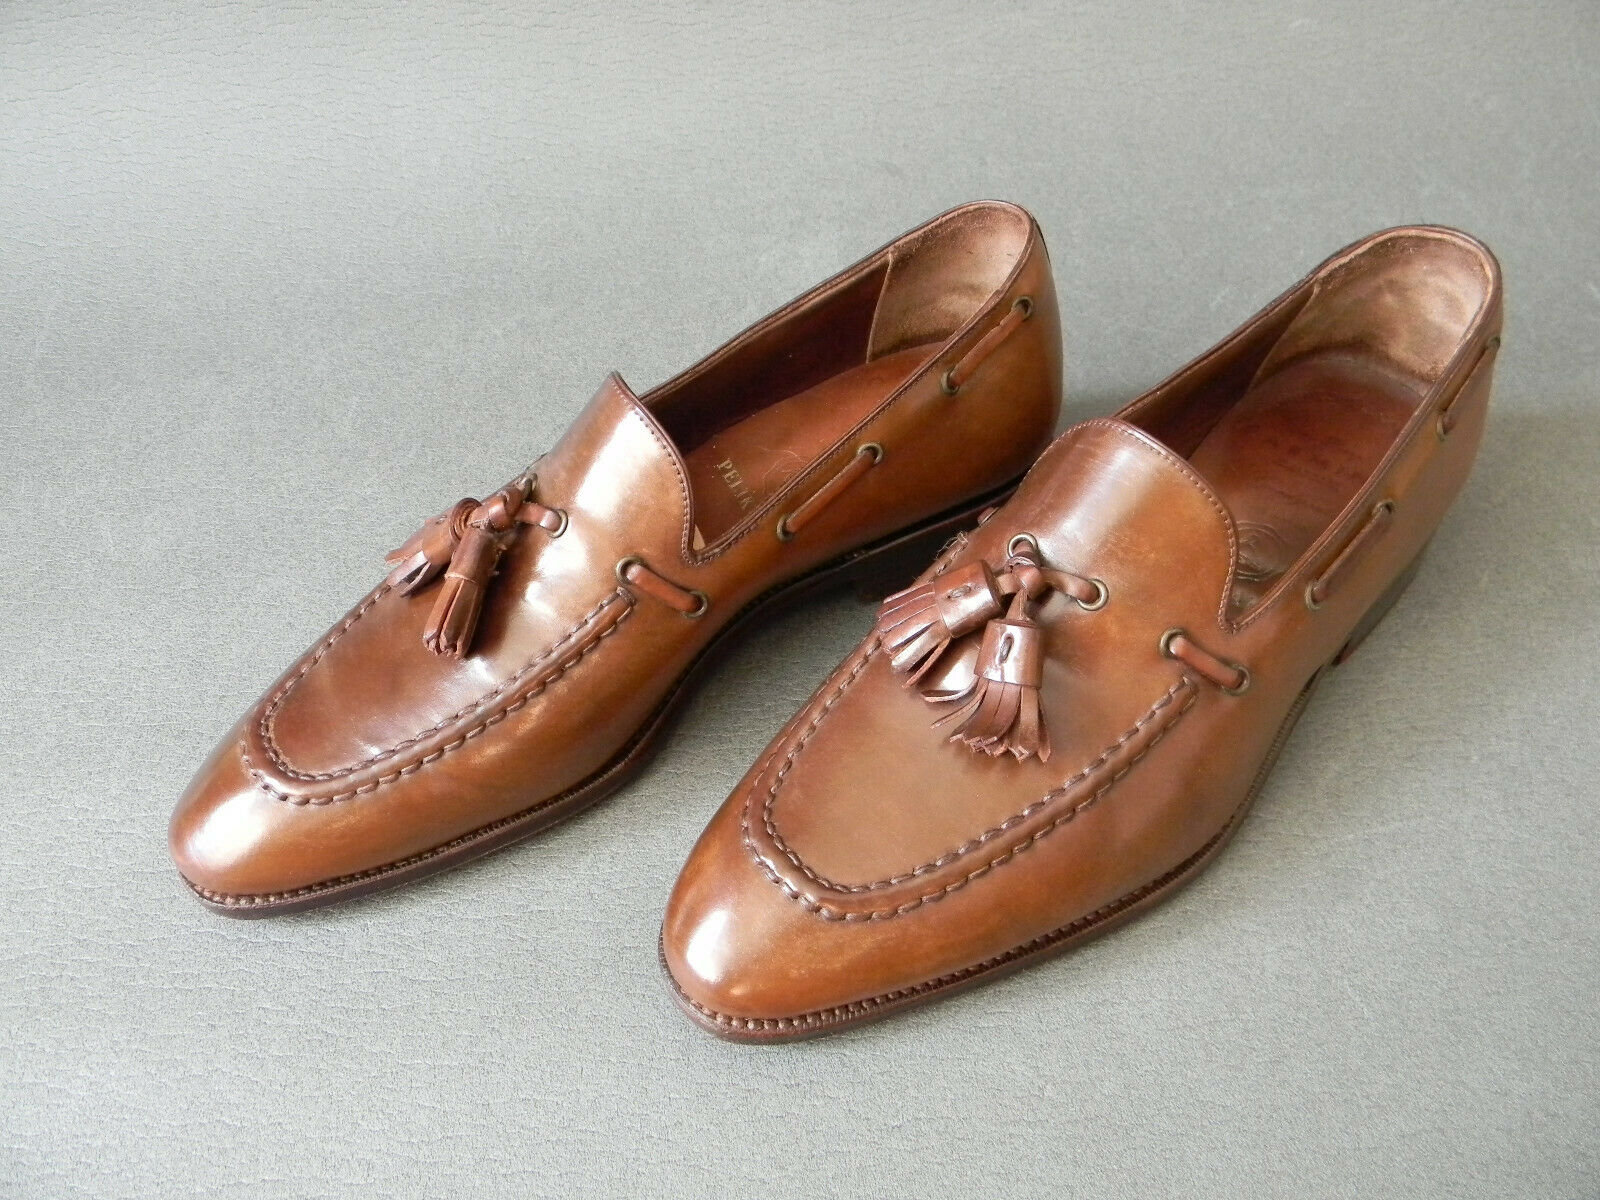 voituremina Bourbon SHELL CORDOVAN Tassel Loafers Homme Chaussures 5.5UK 39.5EU 6.5US